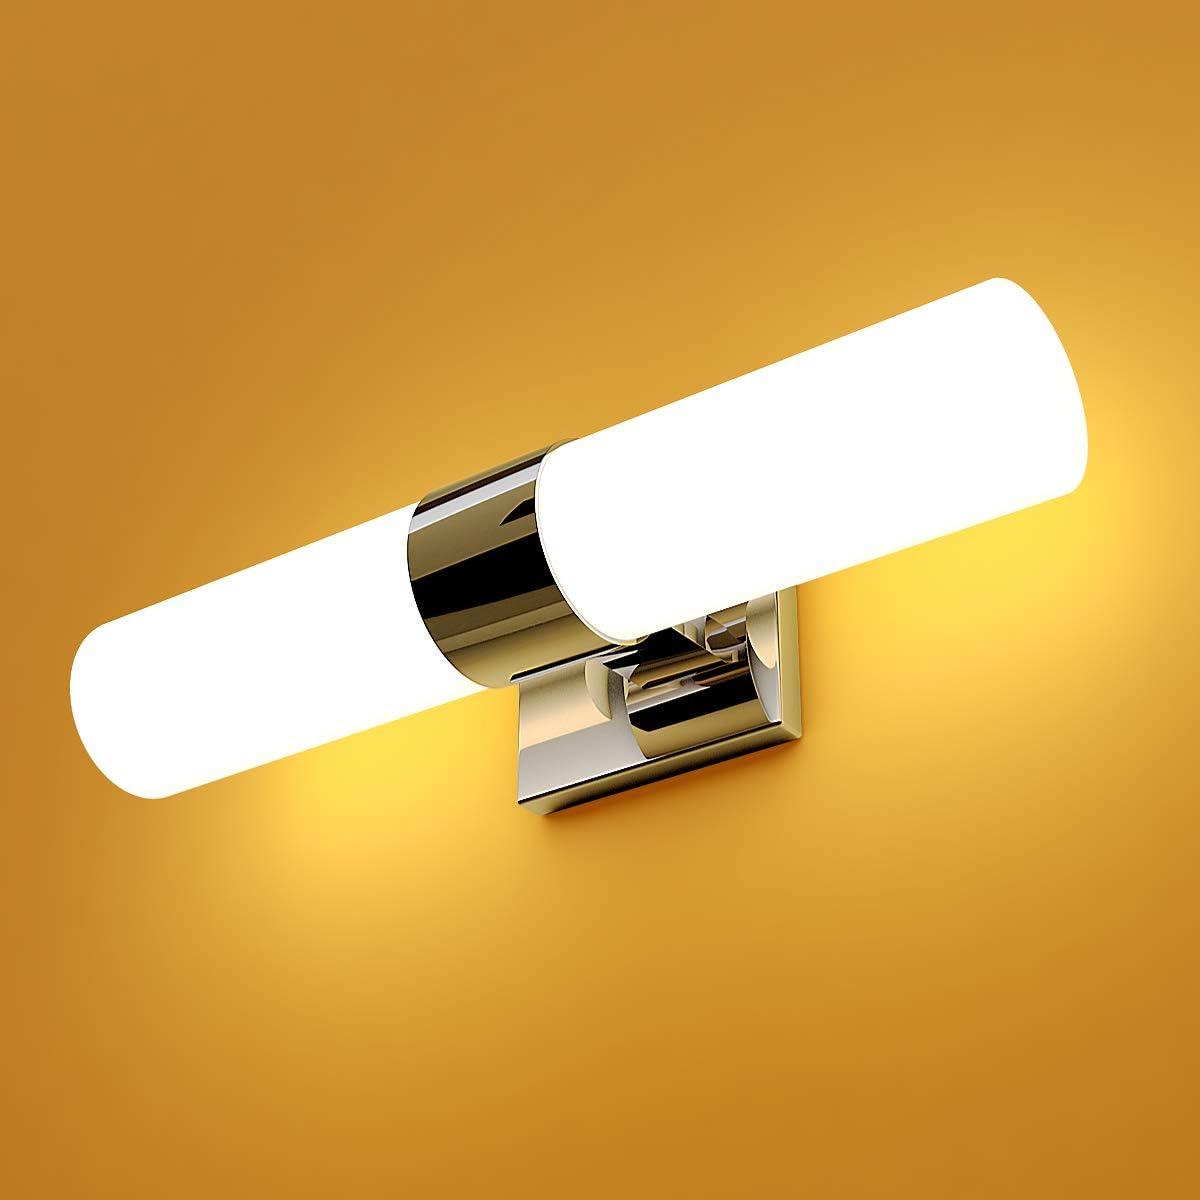 Tangkula 16.5 Bath Light 2-Led Polished Chrome Vanity Fixture Bathroom Lighting Lamp Wall Sconces